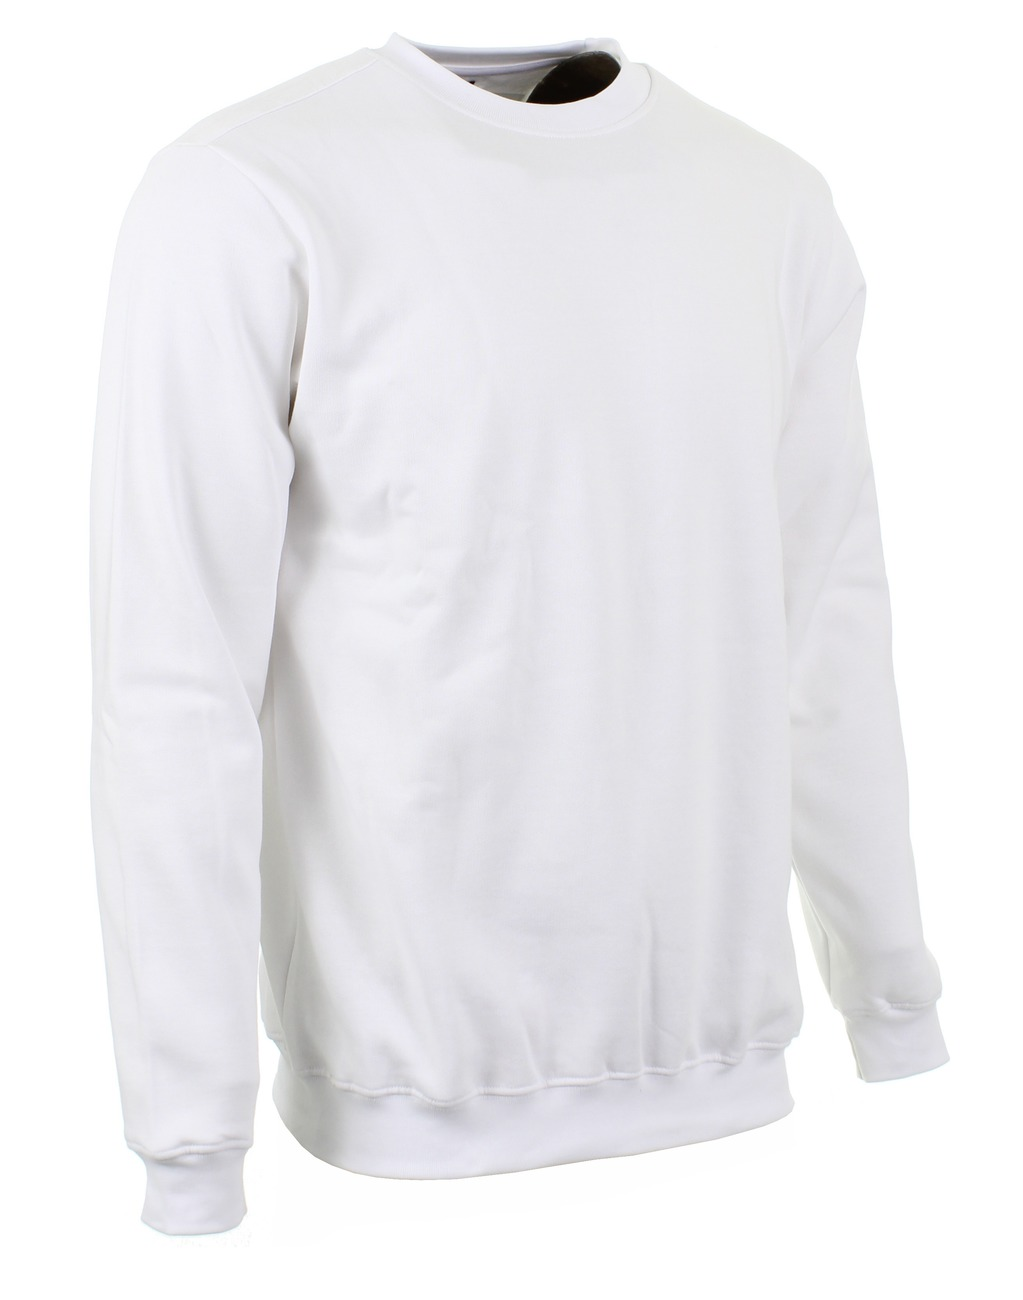 JAN Sweater